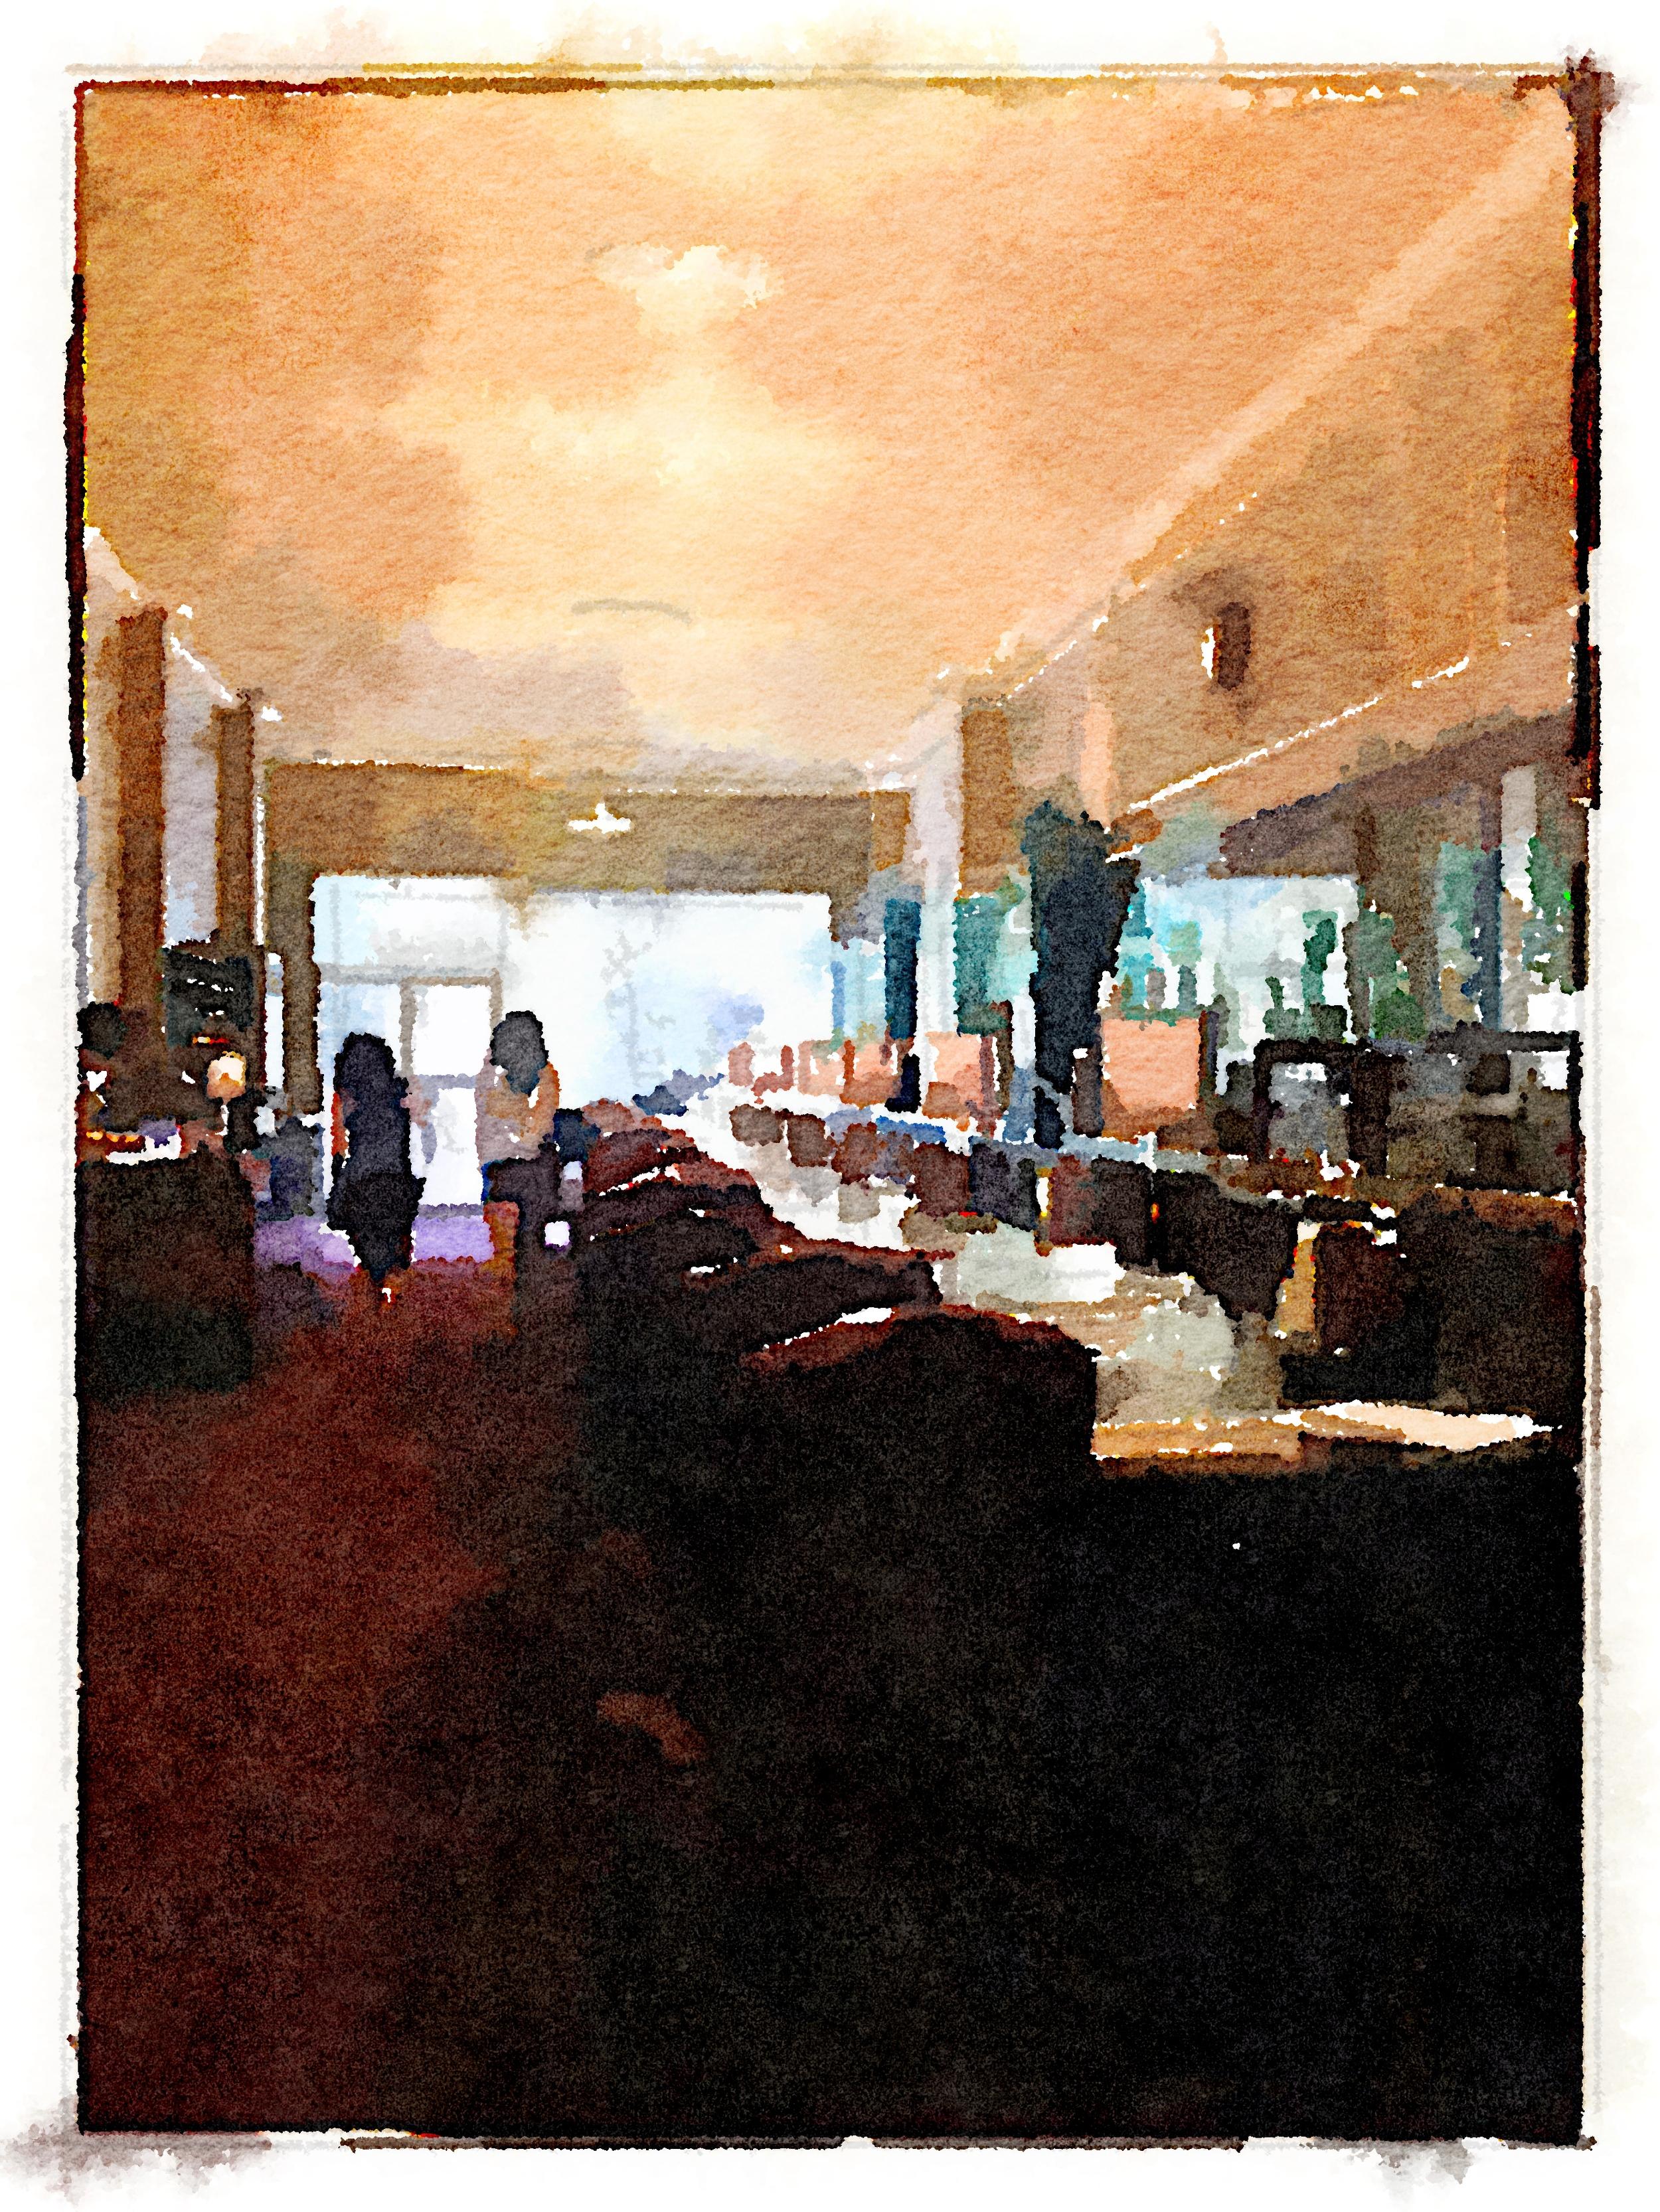 Bar Perspective 2 Art Print